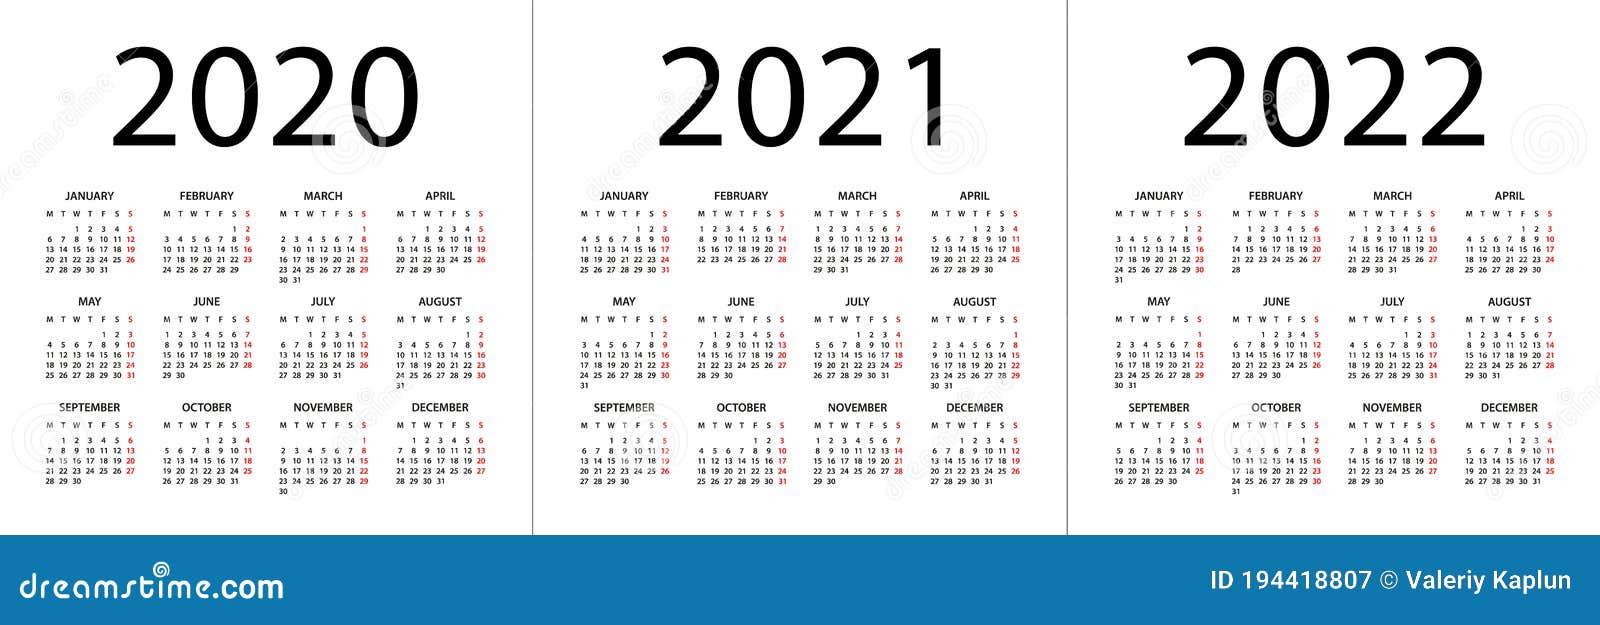 Csn Calendar 2022.Calendar 2020 2021 2022 Illustration Week Starts On Monday Calendar Set For 2020 2021 2022 Years Stock Illustration Illustration Of Assistant Simple 194418807